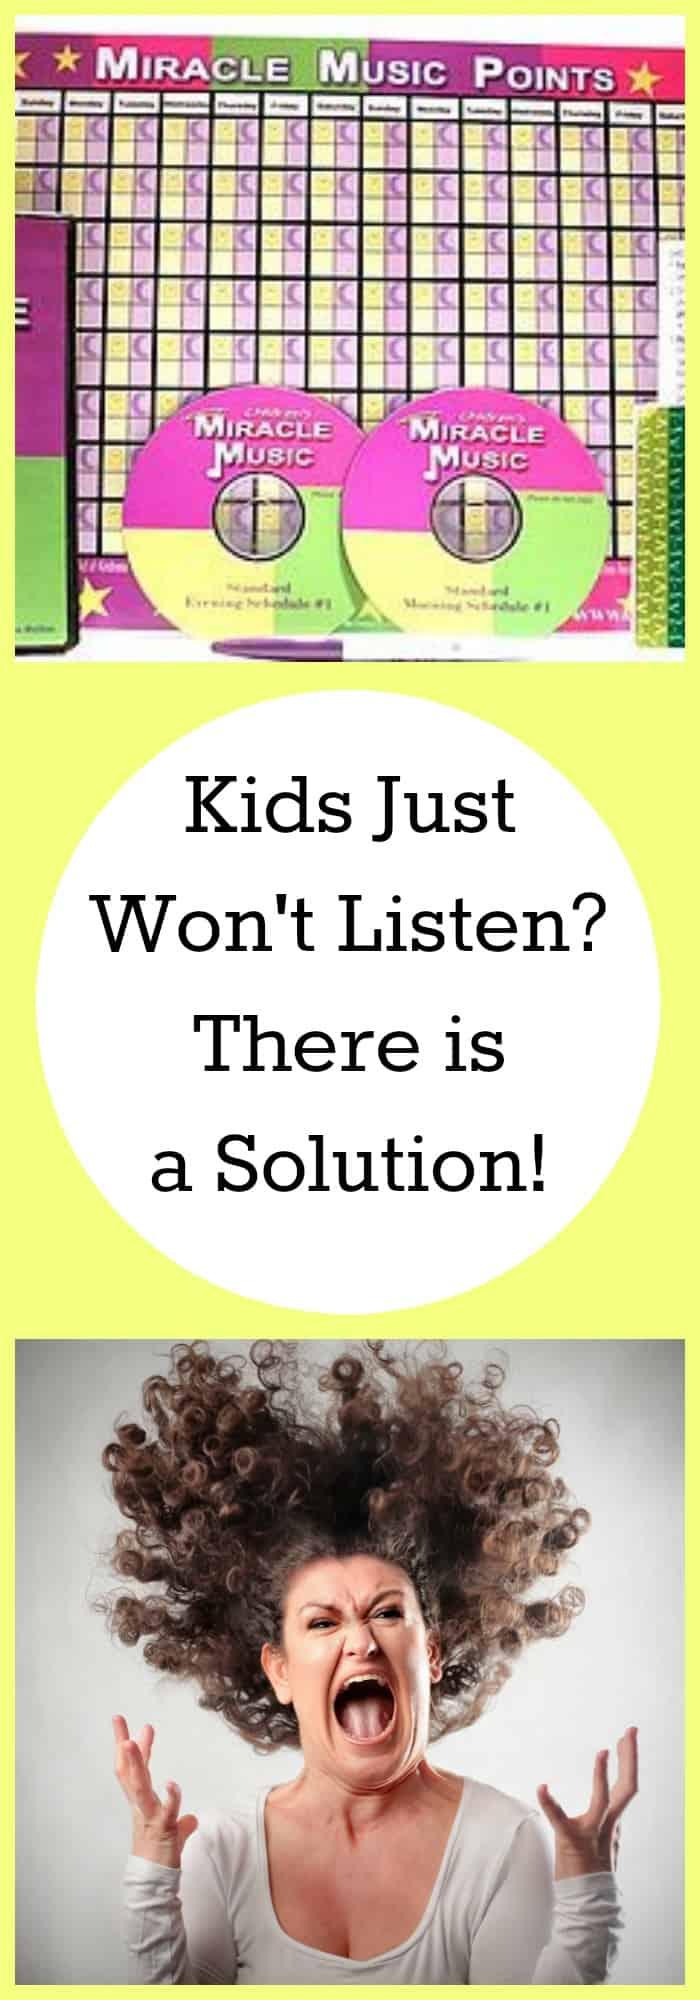 Parenting-Kids Just Won't Listen?-The Organized Mom